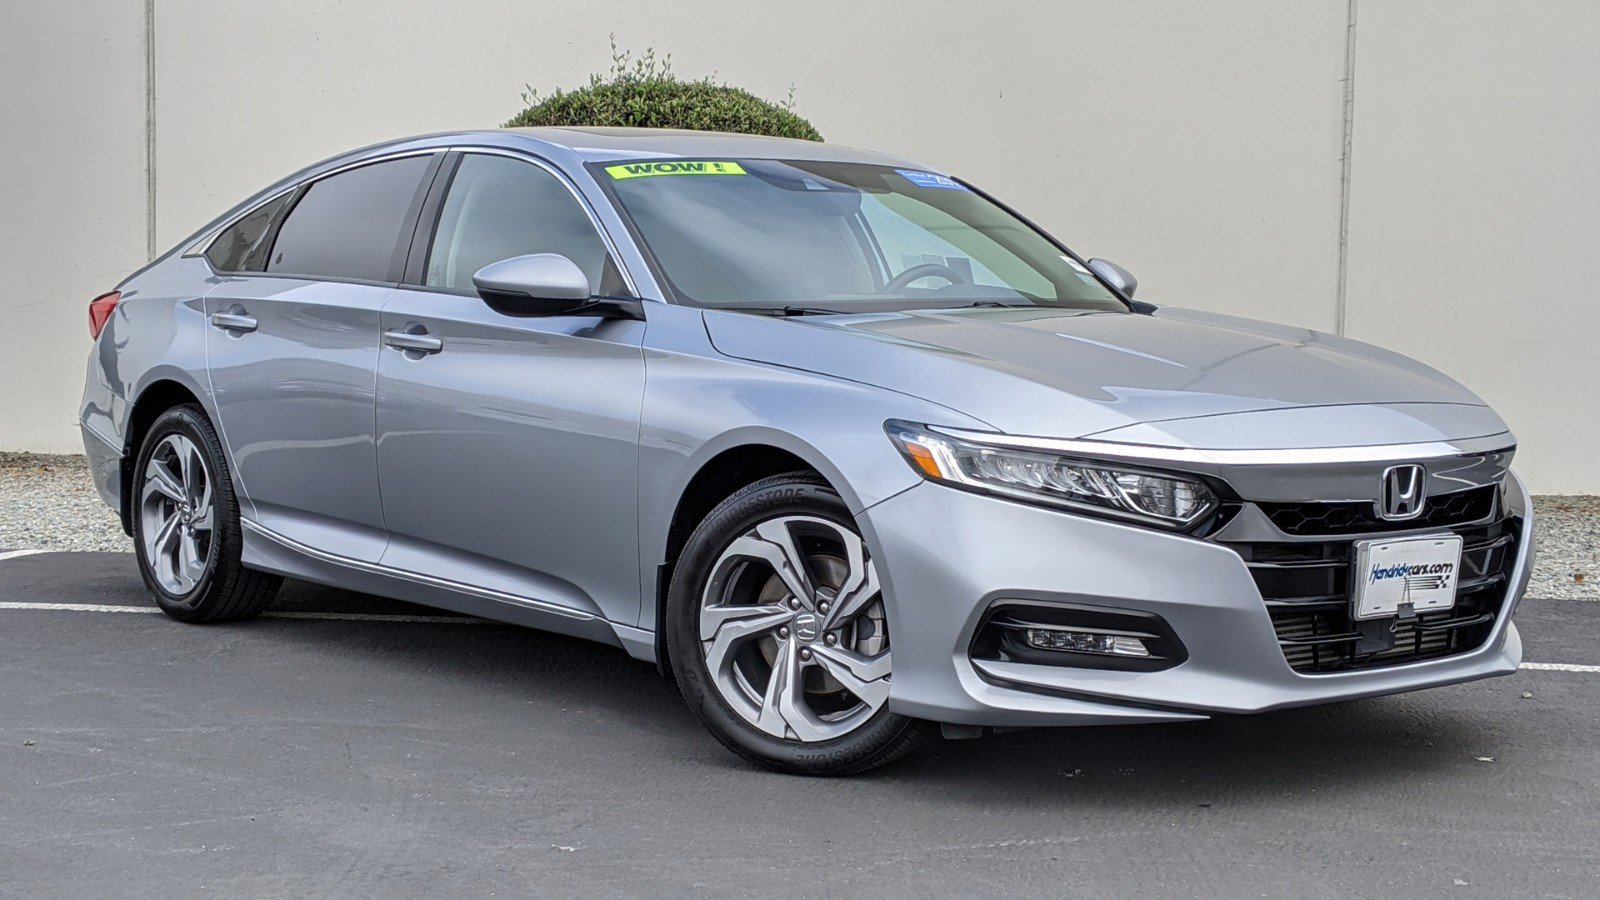 2018 Honda Accord EX-L Navi 1.5T